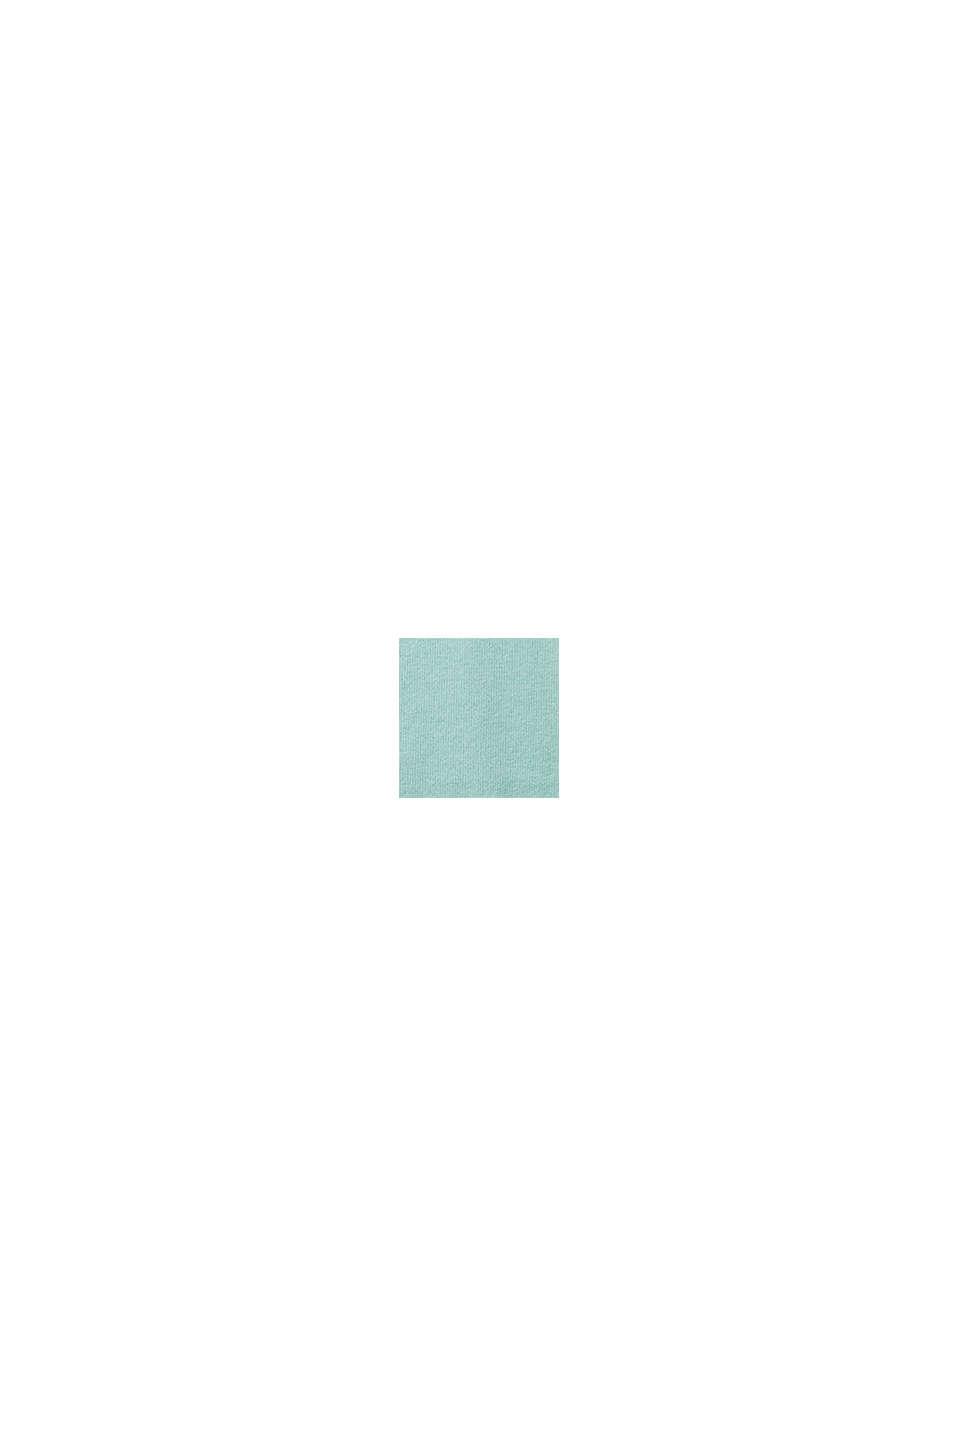 Jersey básico con algodón ecológico, LIGHT TURQUOISE, swatch